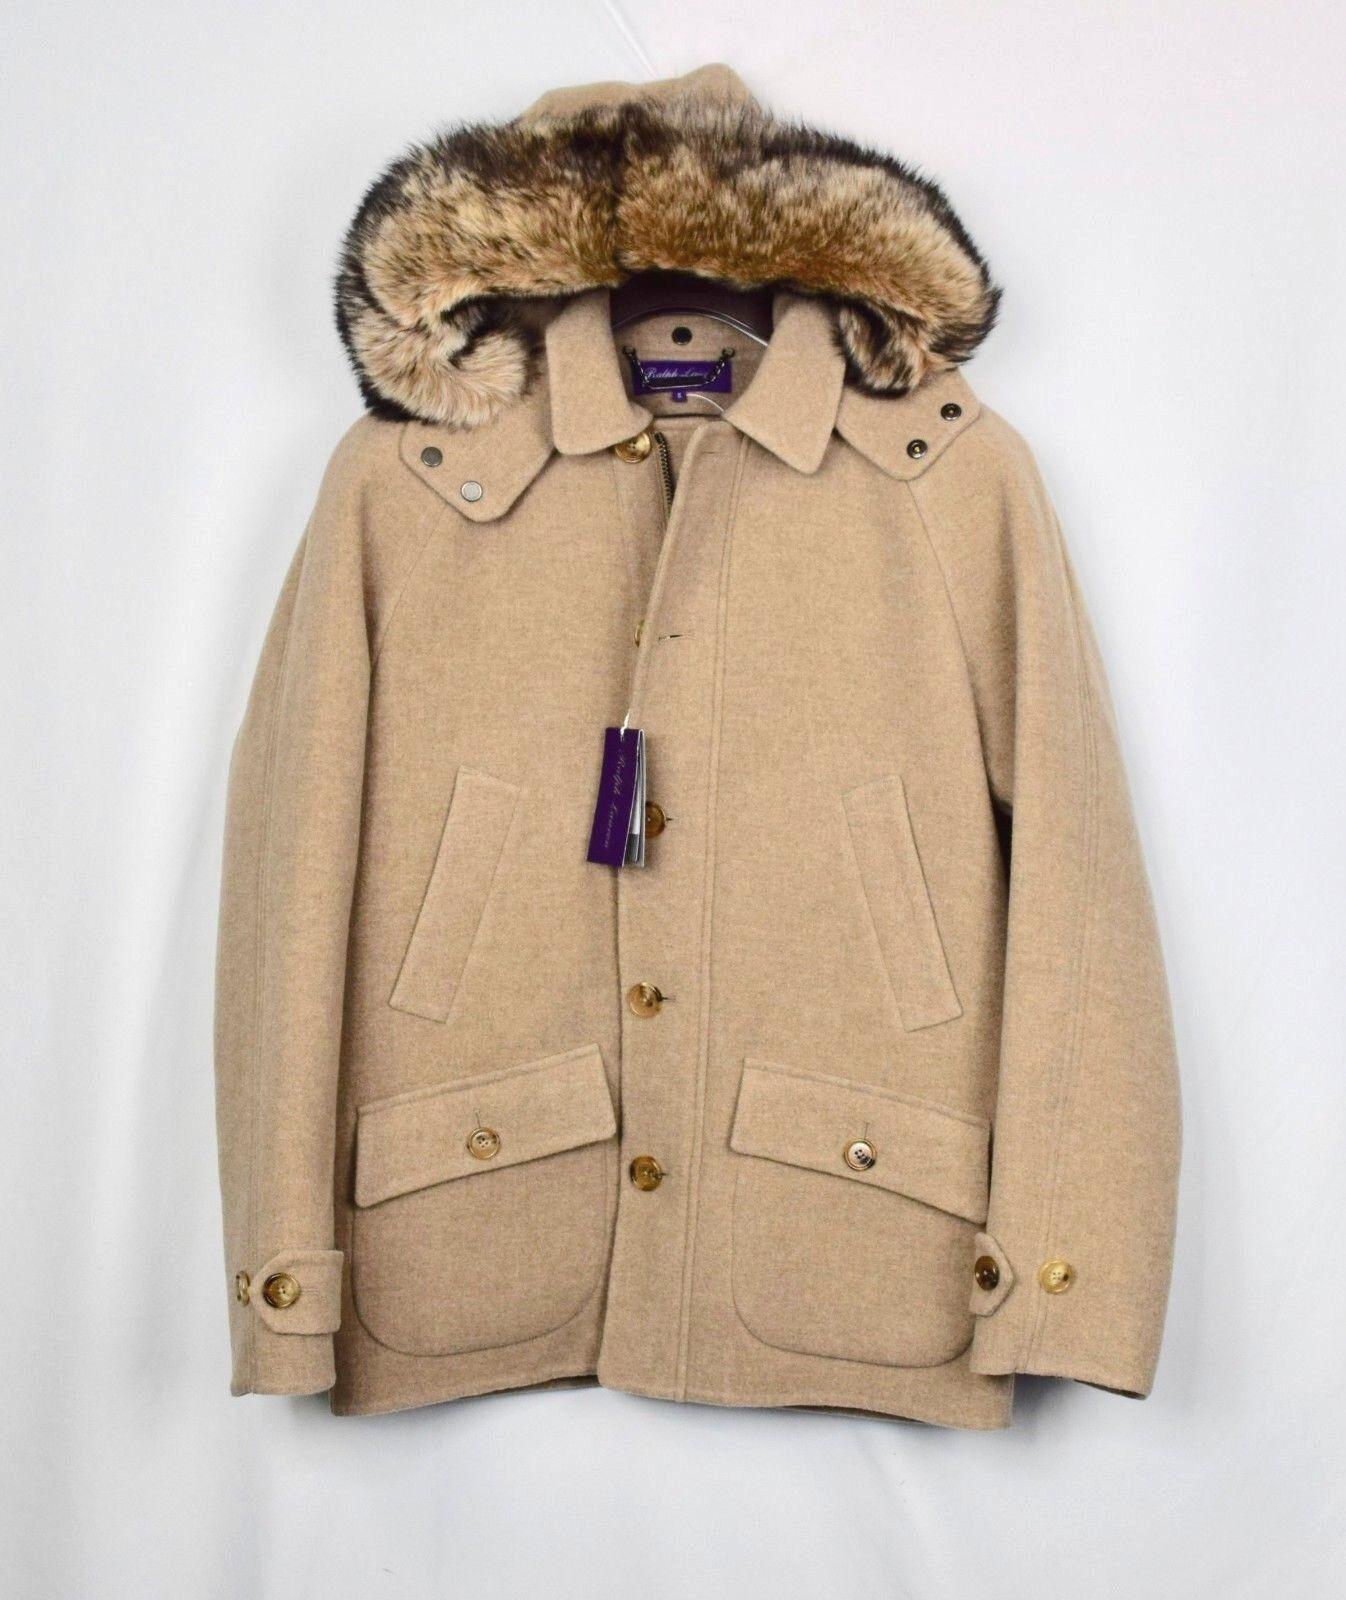 Ralph Lauren lila Label 3-in-1 Wolle Wolle Wolle und Pelz Parka GRÖSSE S     | Fierce Kaufen  fa0485